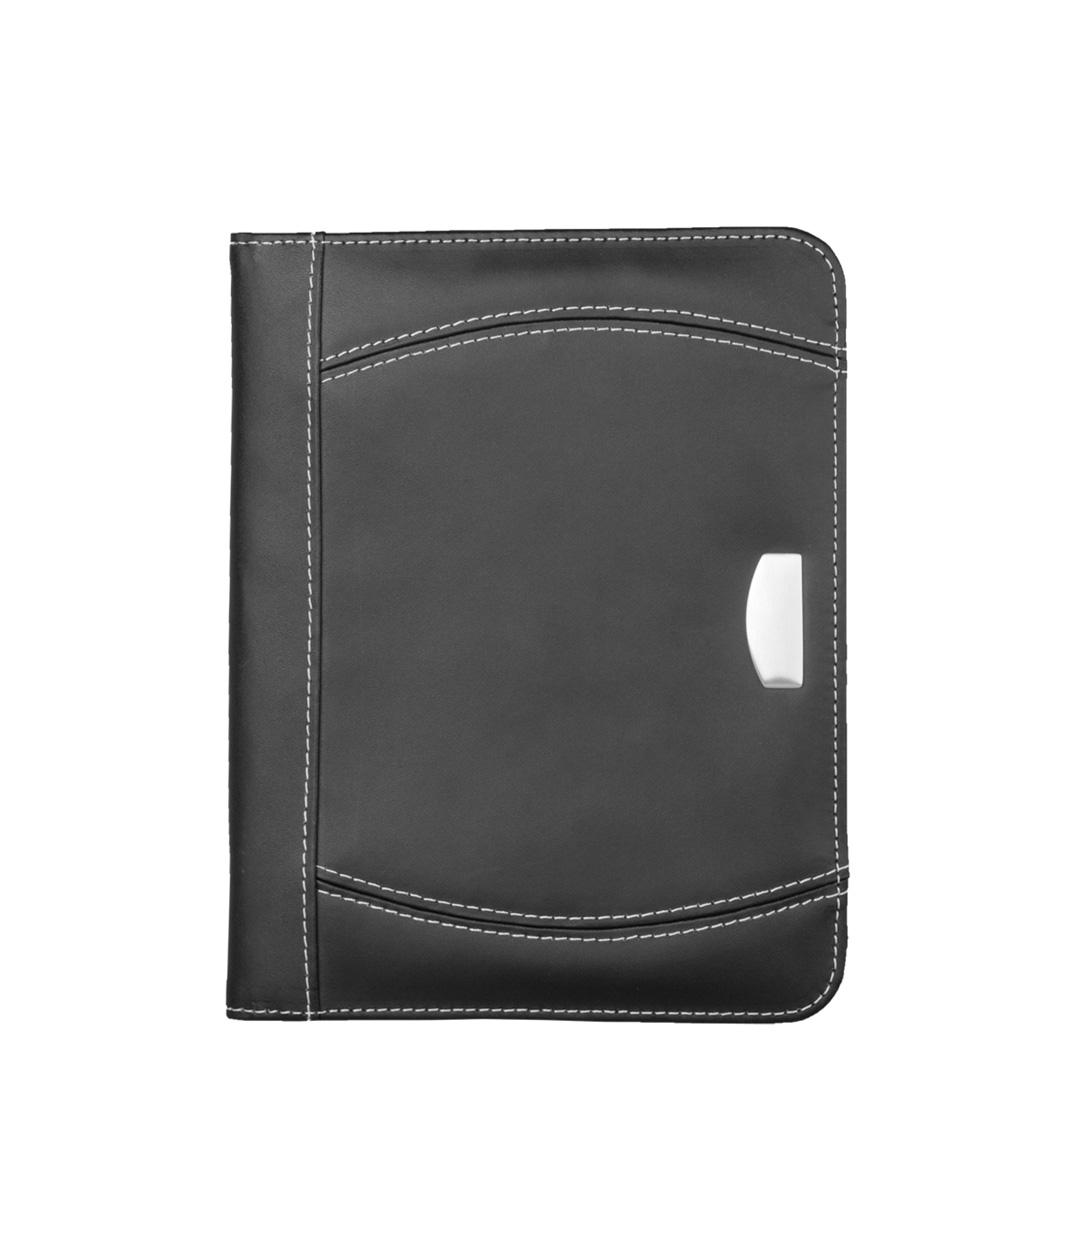 Central A5 zipped document folder